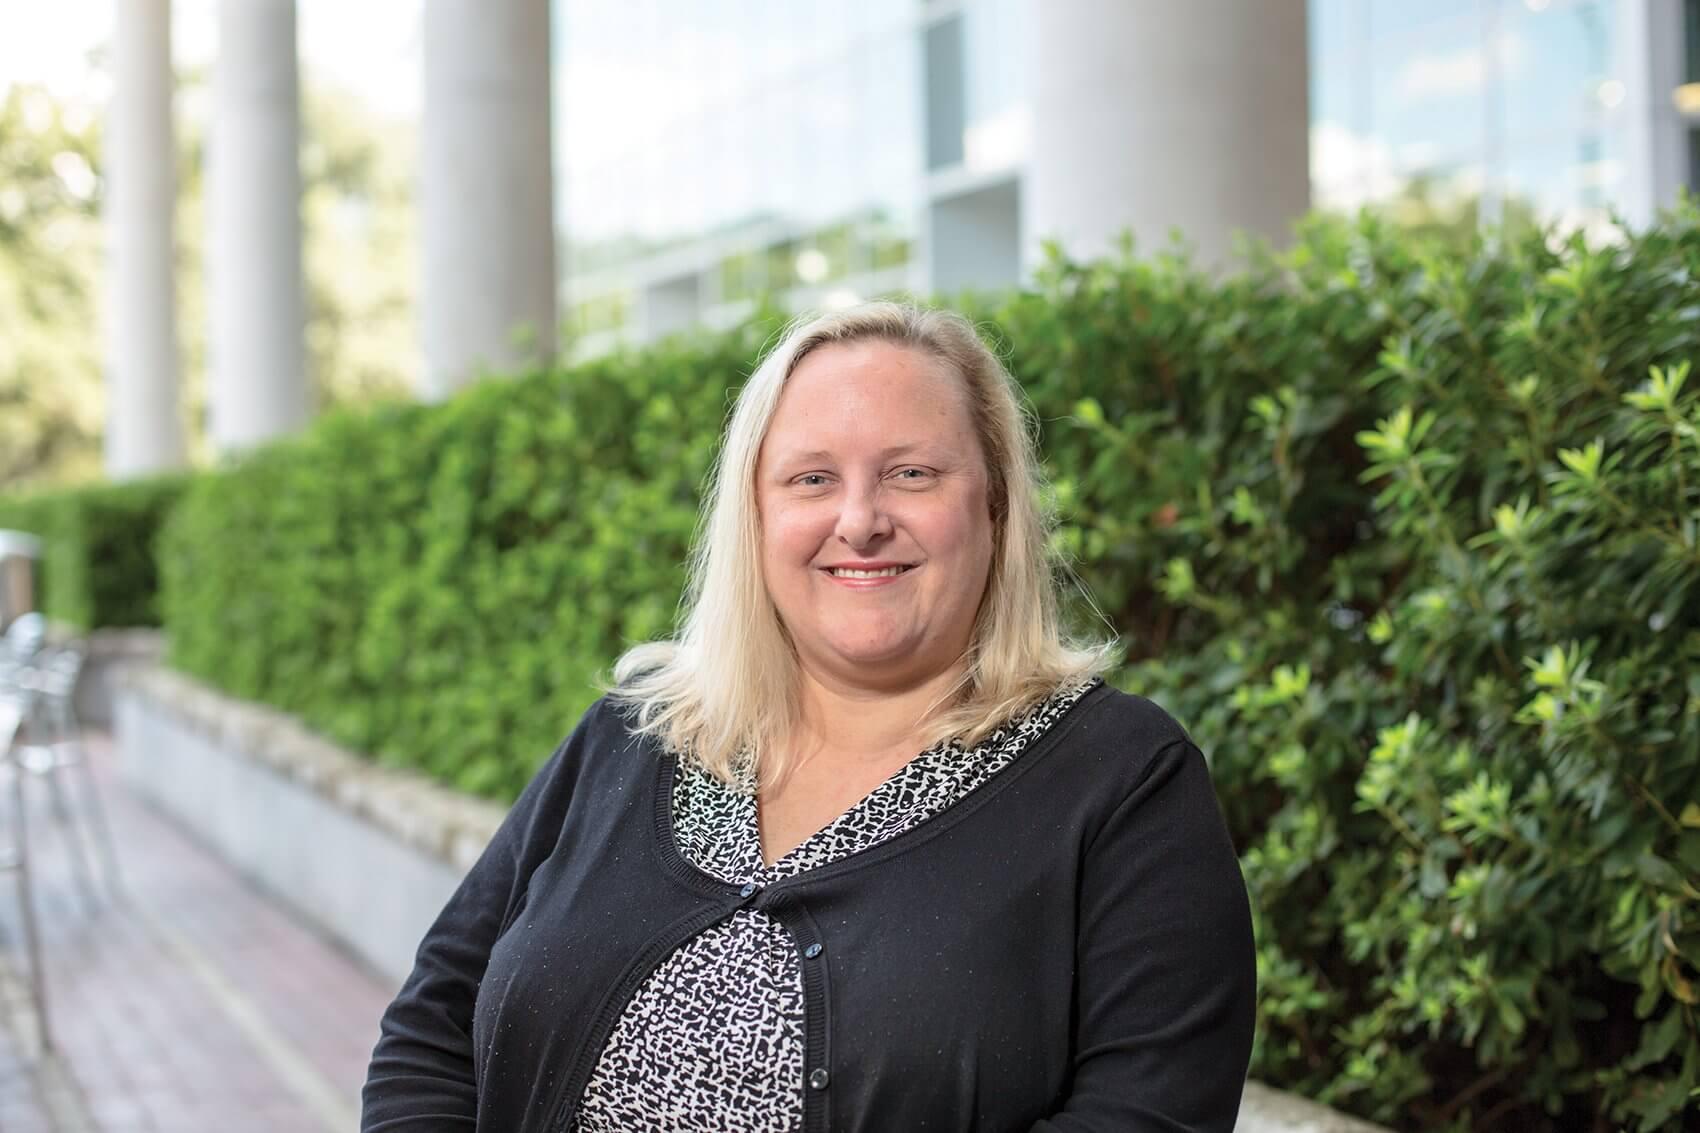 Jane Grande-Allen, Ph.D., Isabel C. Cameron Professor of Bioengineering at Rice University